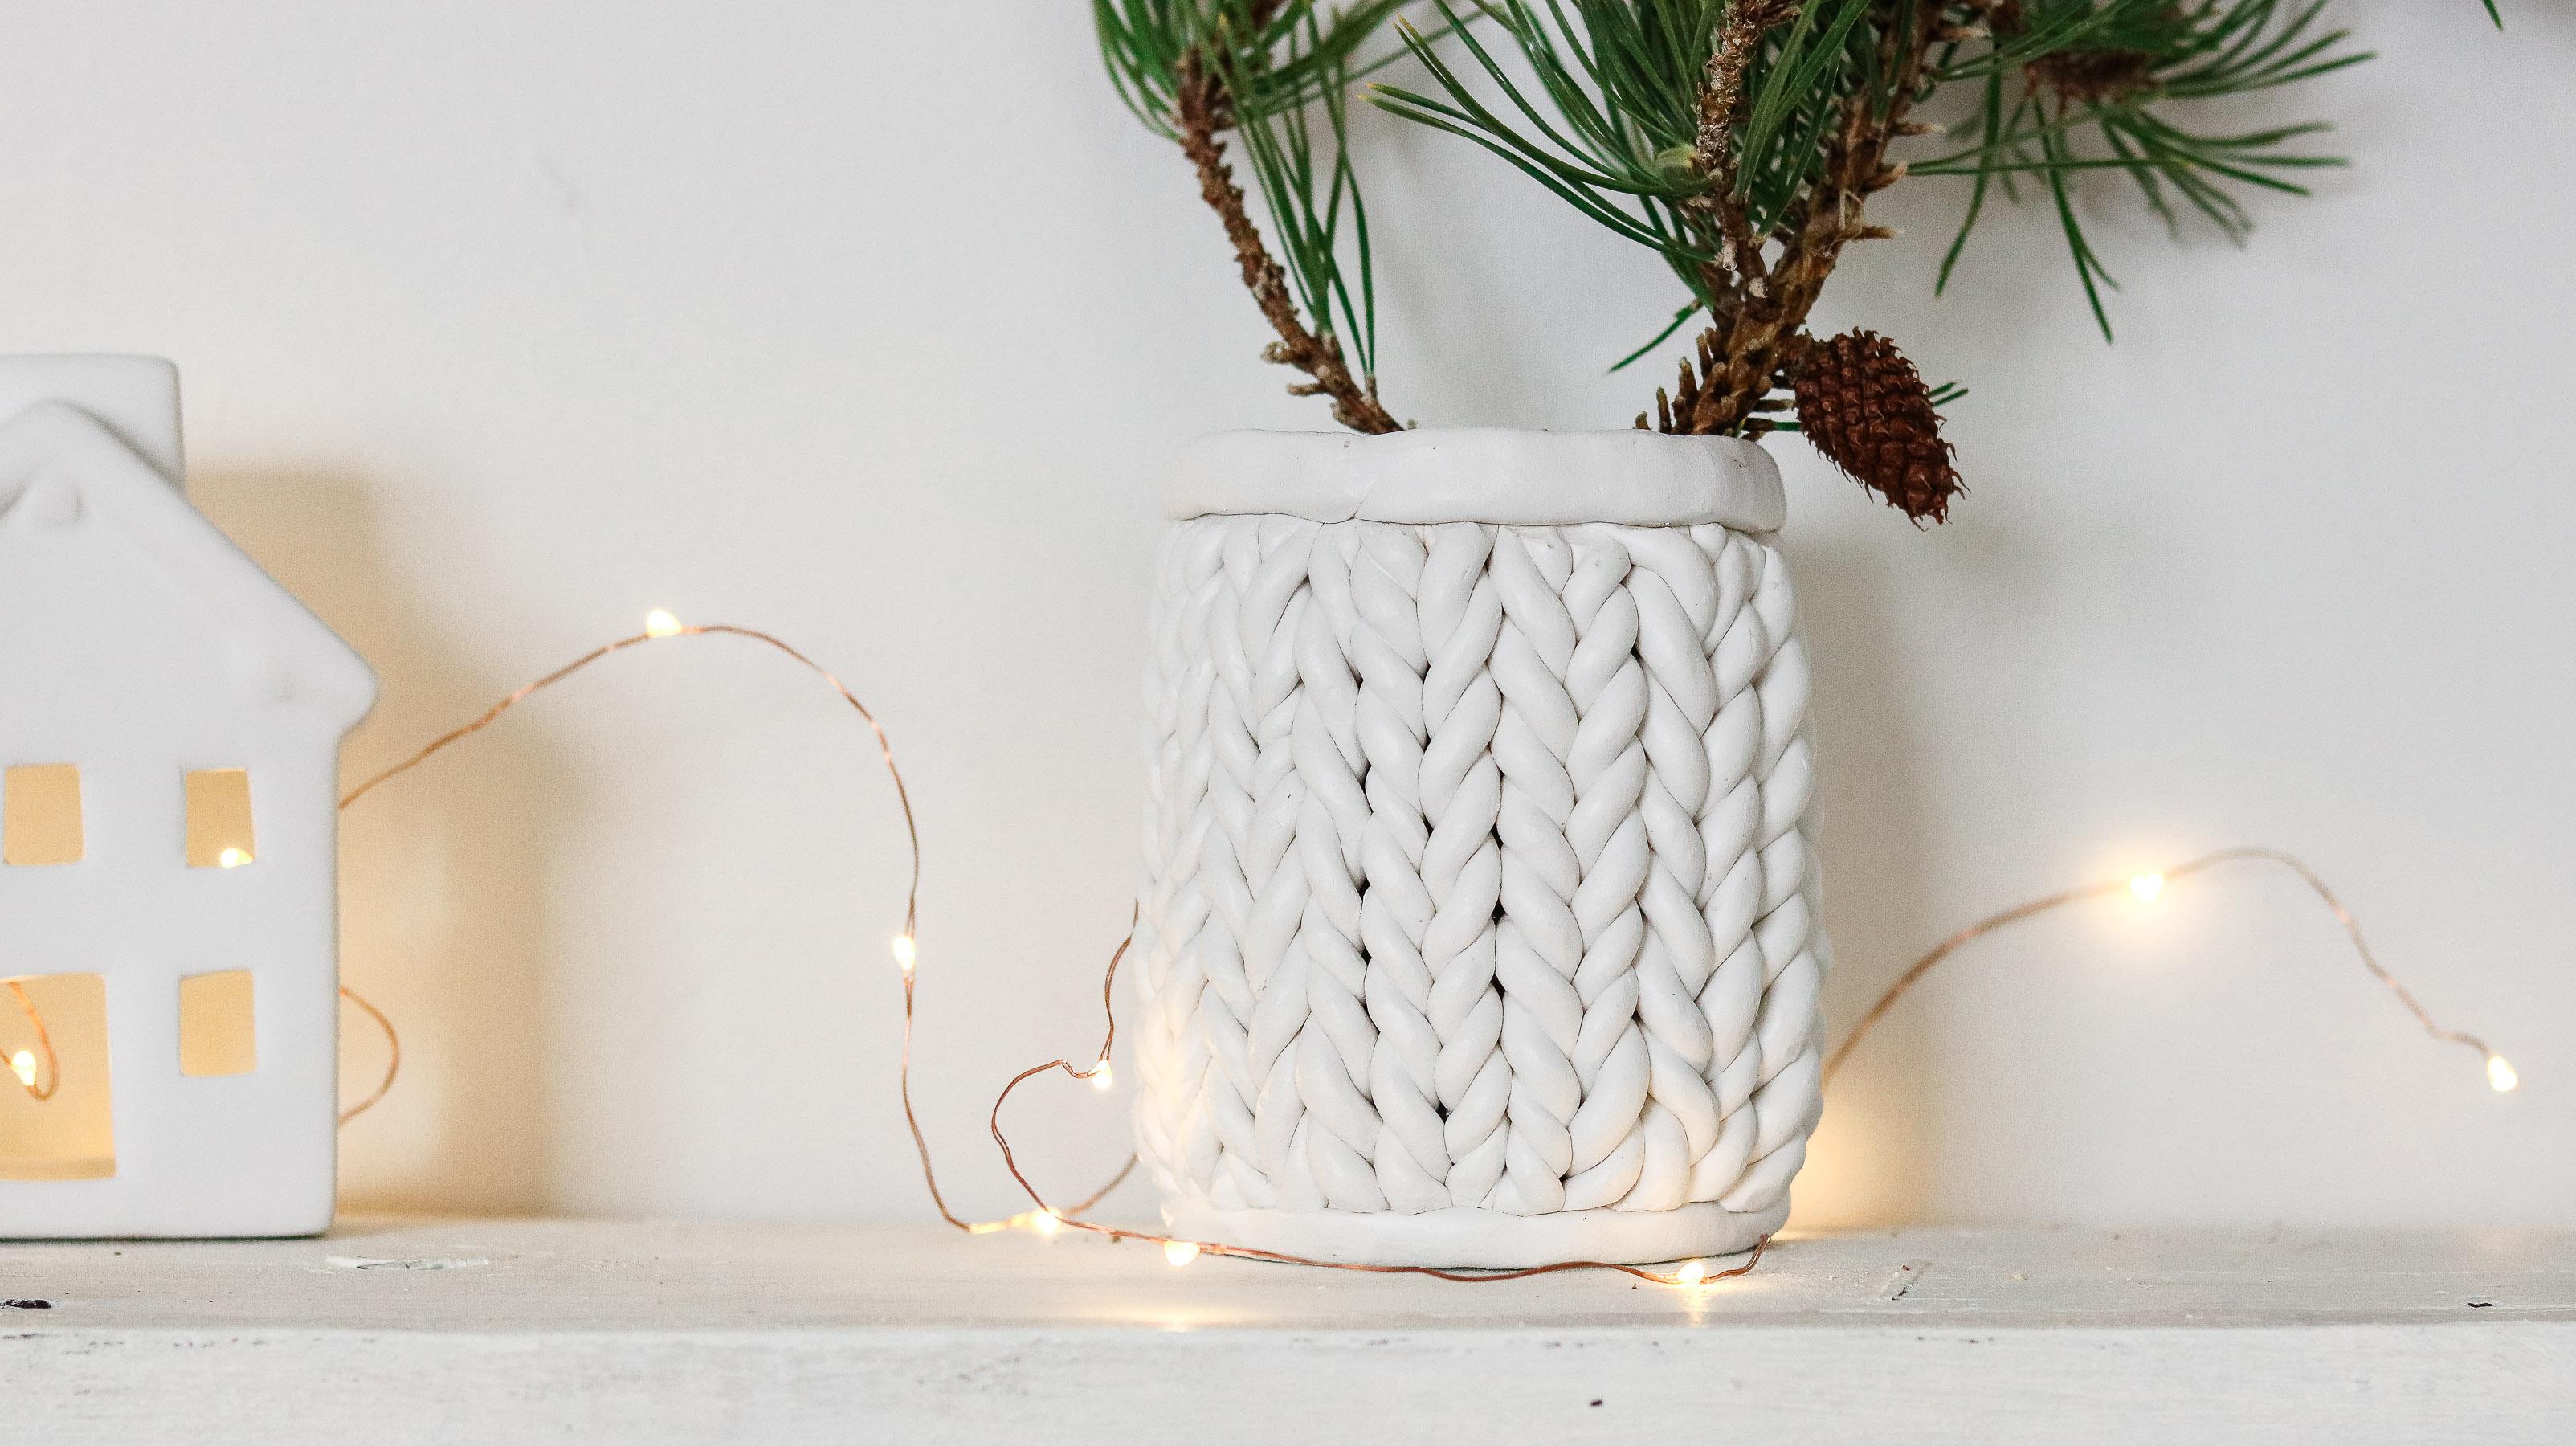 Diy Chunky Knit Using Clay Chunky Knit Planter Lily Ardor border=